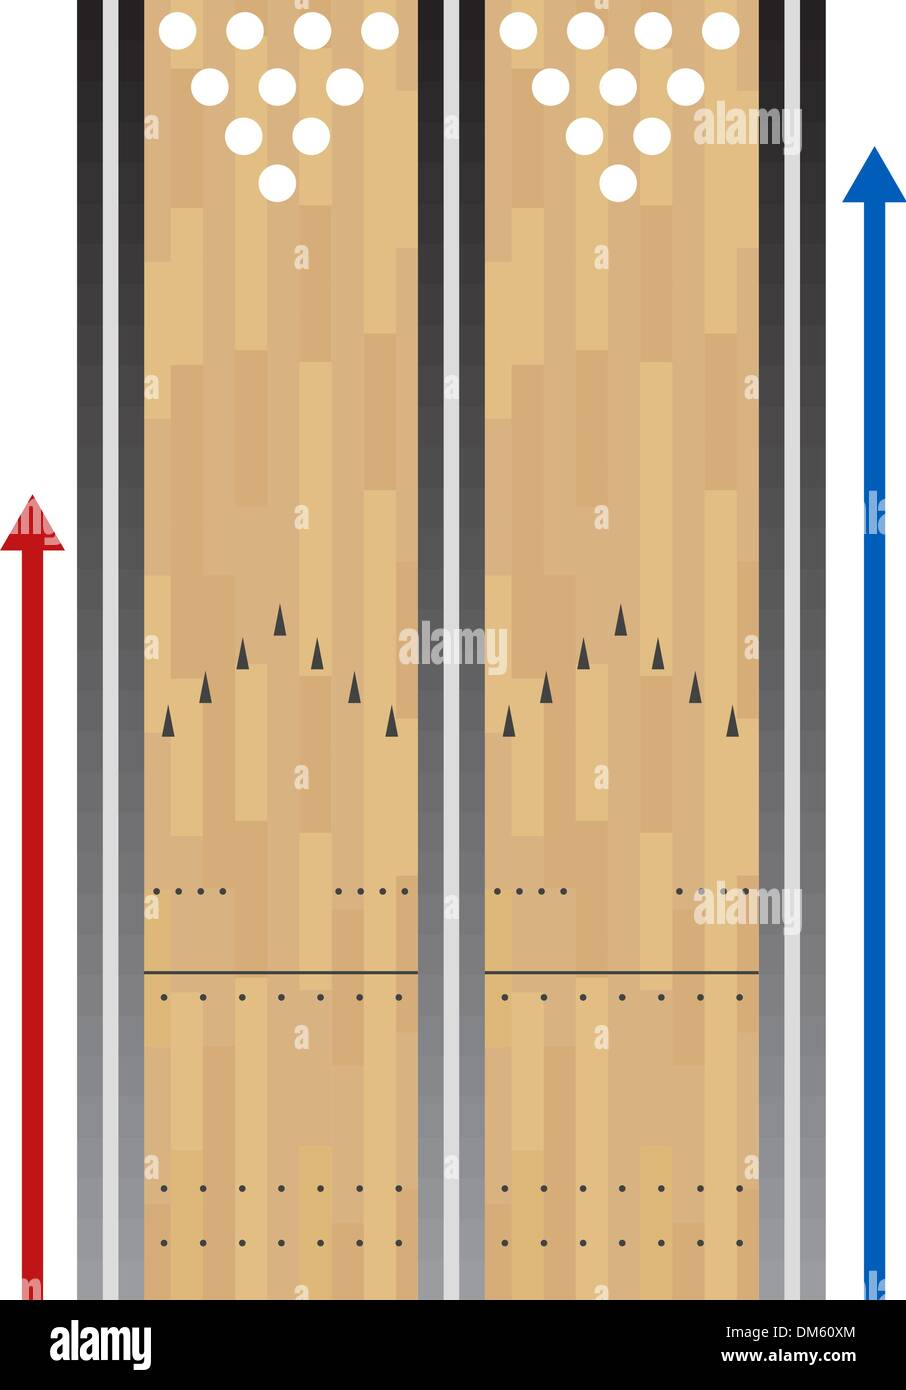 bowling lane chart DM60XM bowling lane stock vector images alamy